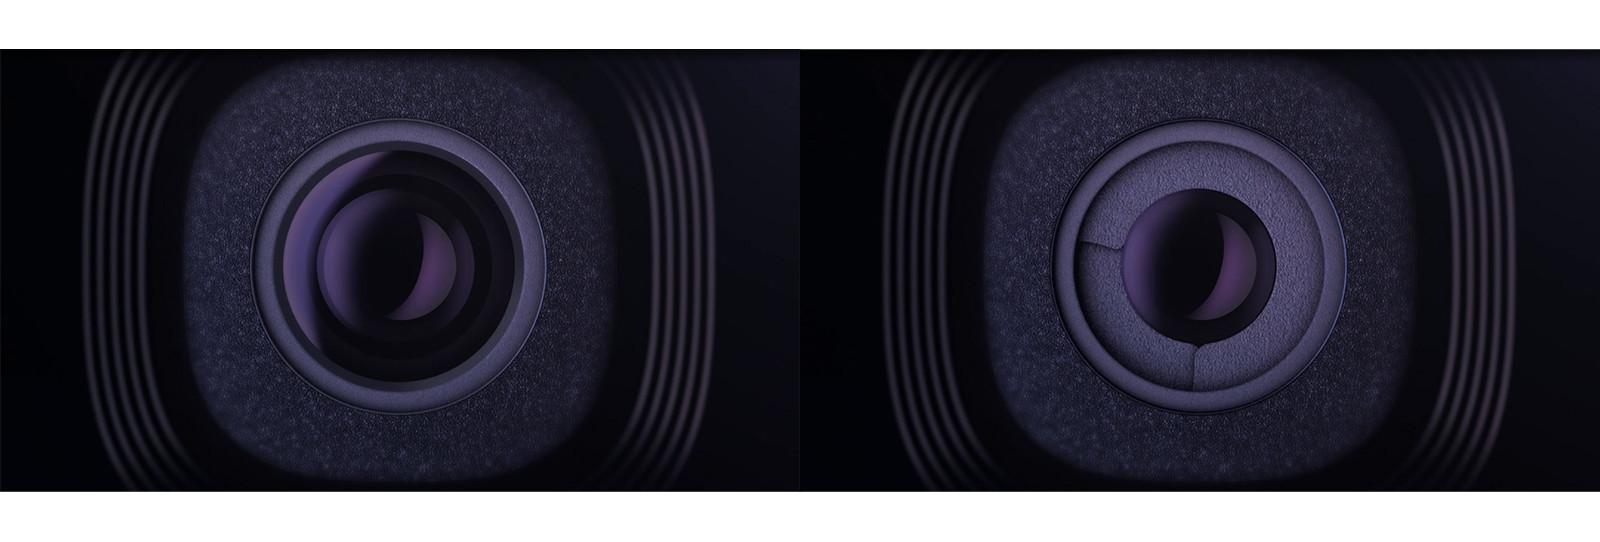 تست دوربین گلکسی اس 9+ در شرایط نوری ضعیف